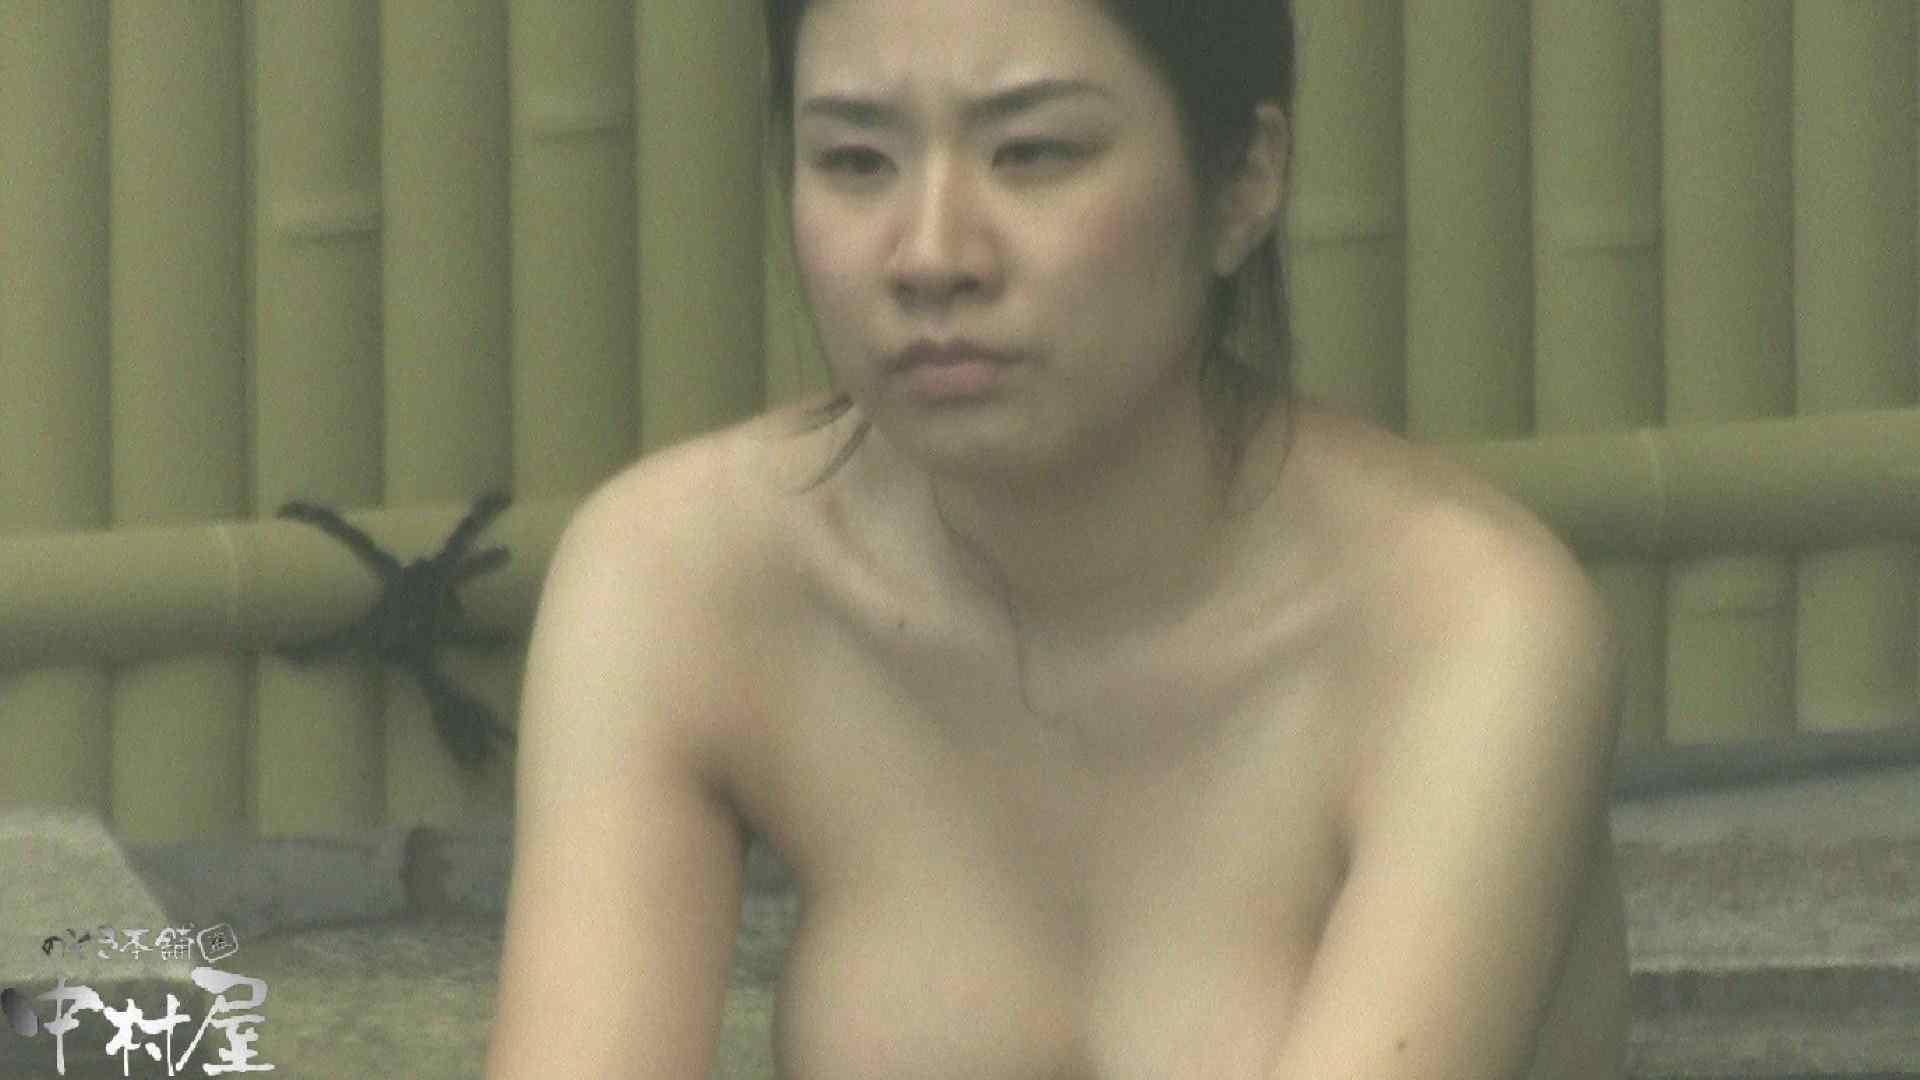 Aquaな露天風呂Vol.913 いやらしいOL アダルト動画キャプチャ 65連発 22